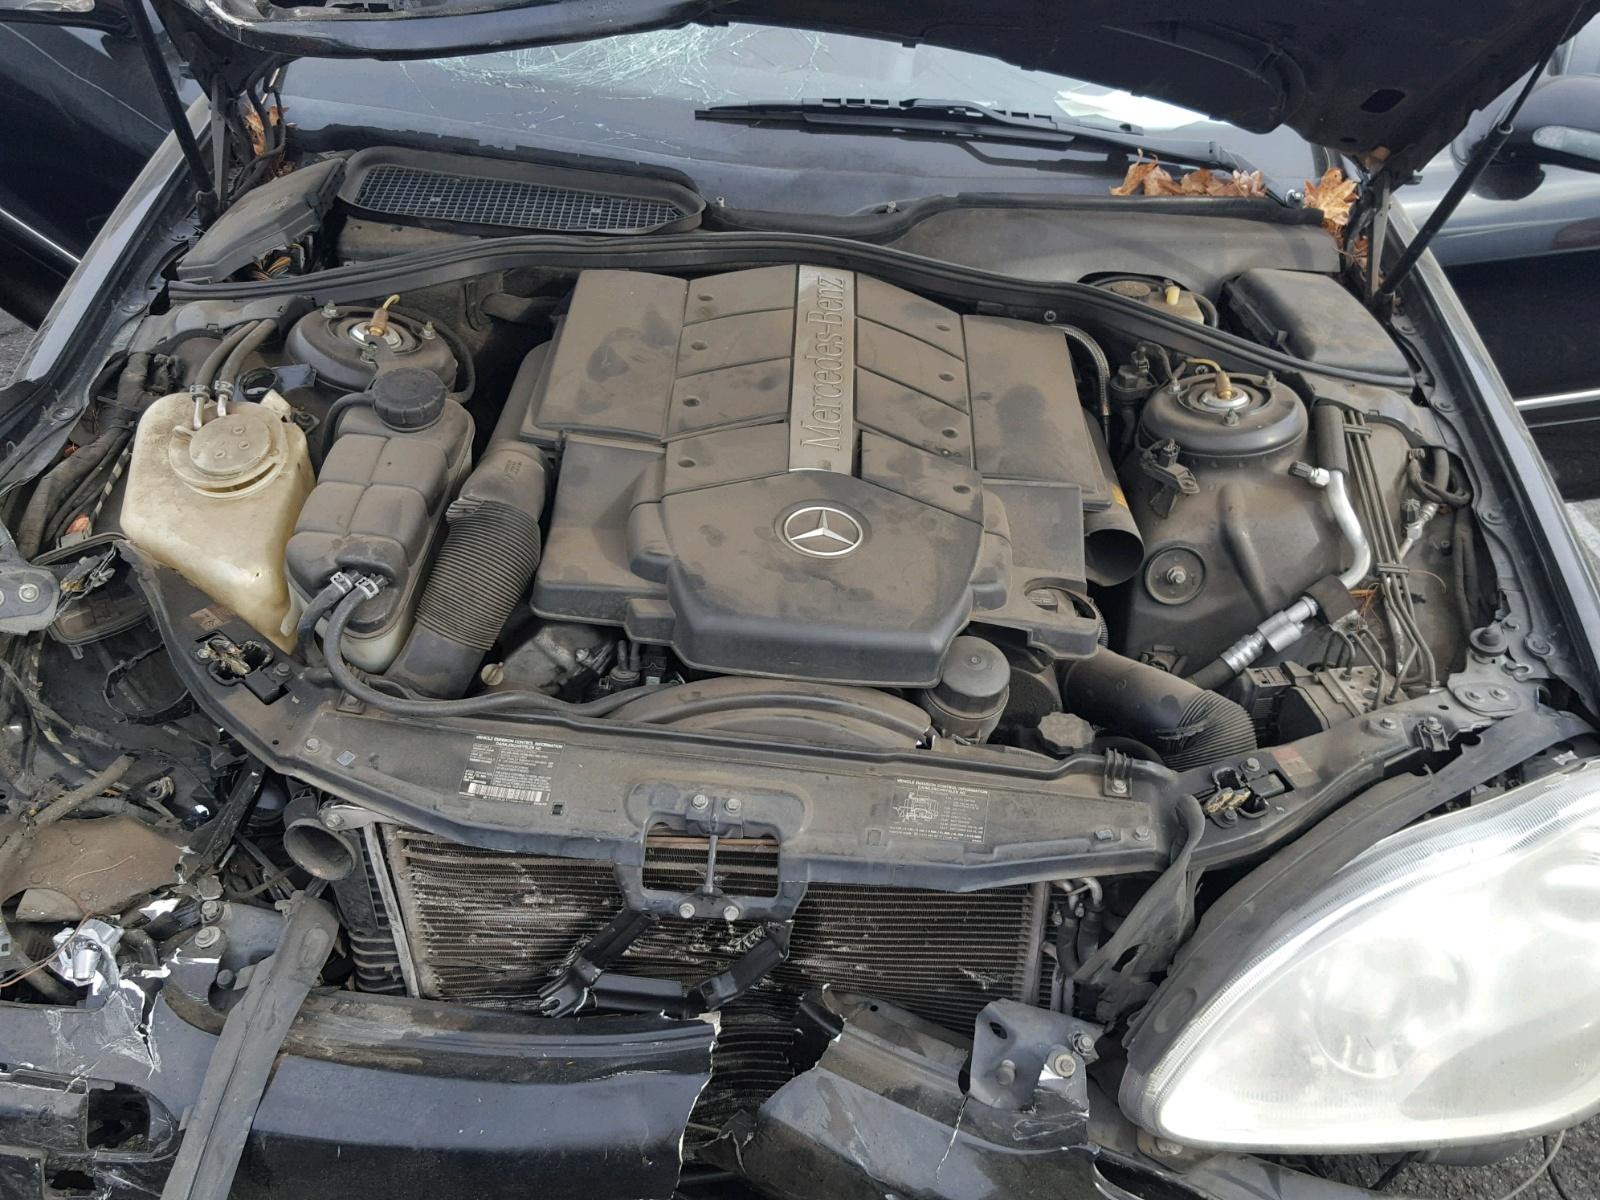 2000 Mercedes-Benz S 500 5 0L 8 in CA - Van Nuys (WDBNG75J5YA050019